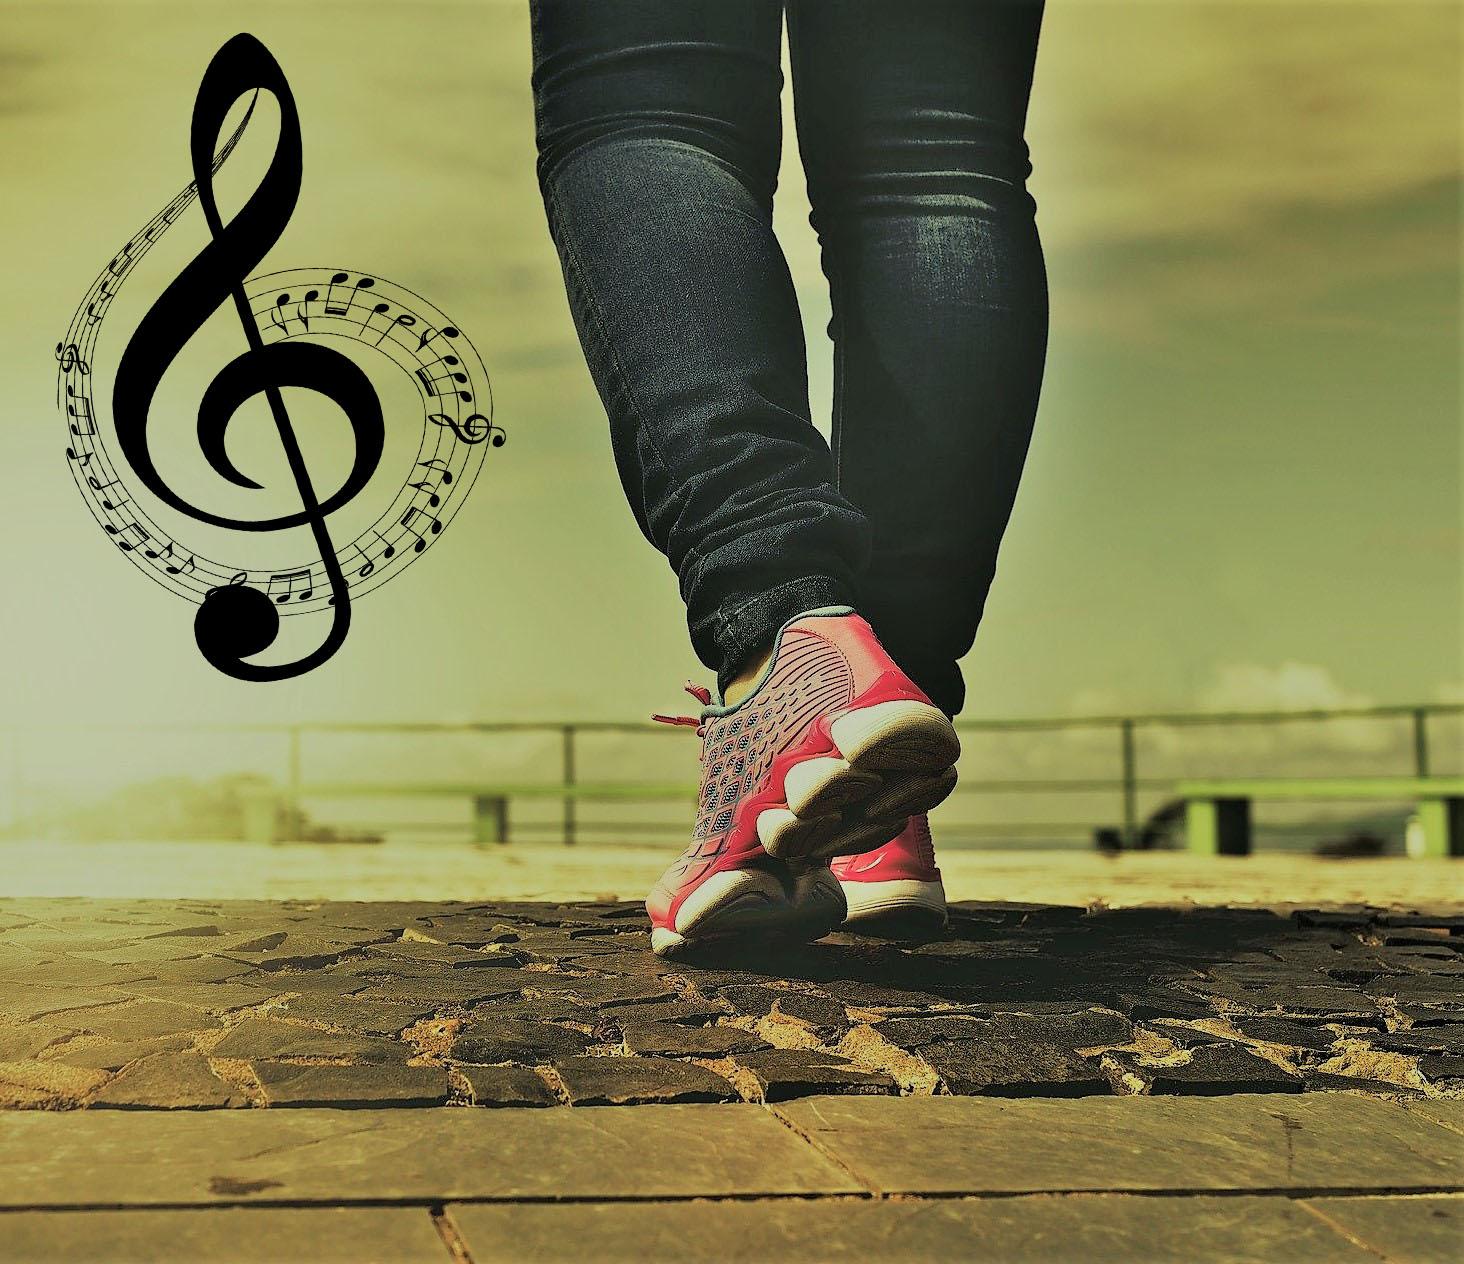 Muziek werkt positief op loopdynamiek